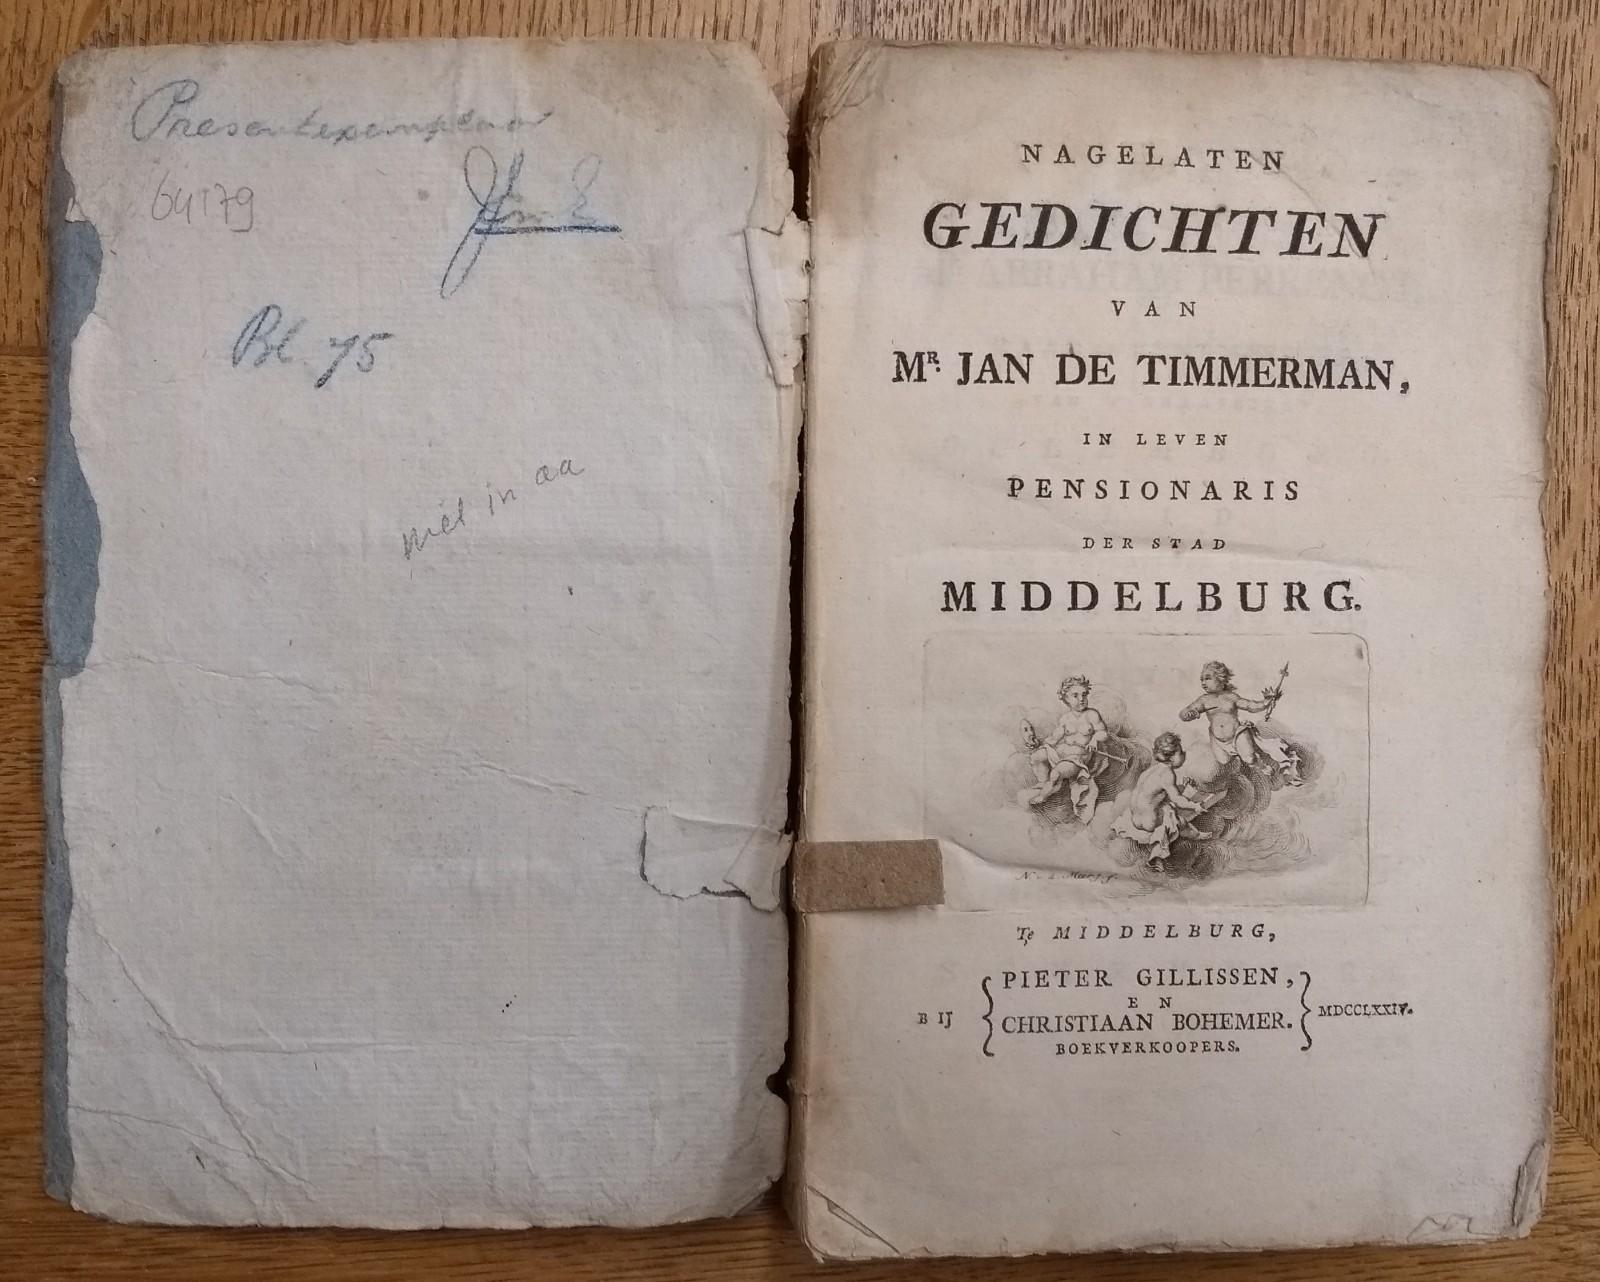 TIMMERMAN, MR. JAN DE, Nagelaten gedichten van Mr. Jan de Timmerman, in leven pensionaris der stad Middelburg